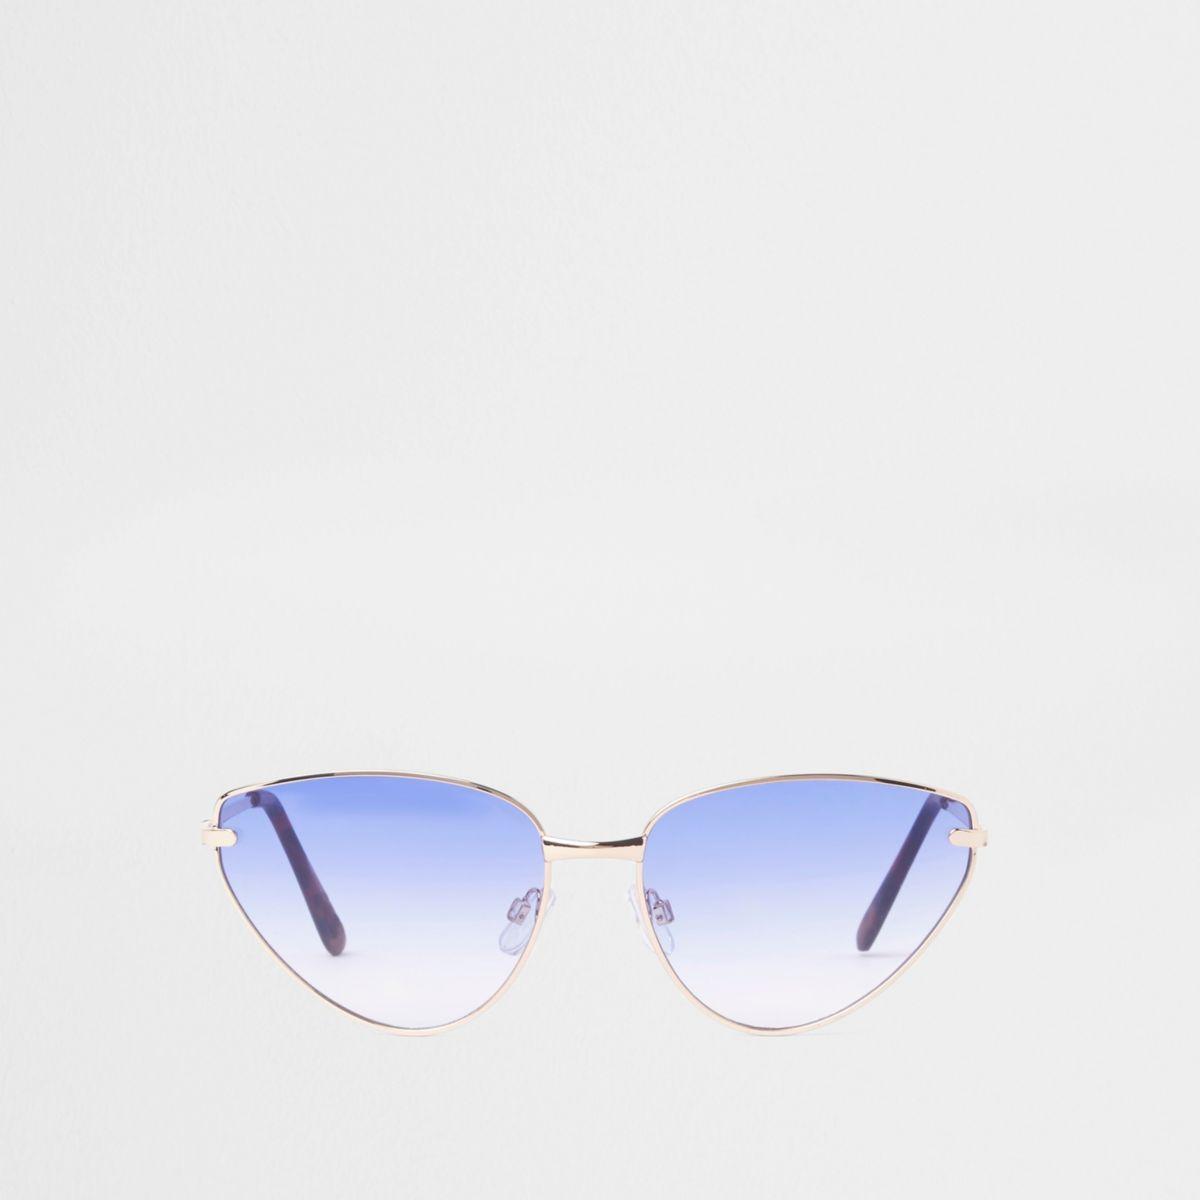 Gold tone blue lens cat eye sunglasses